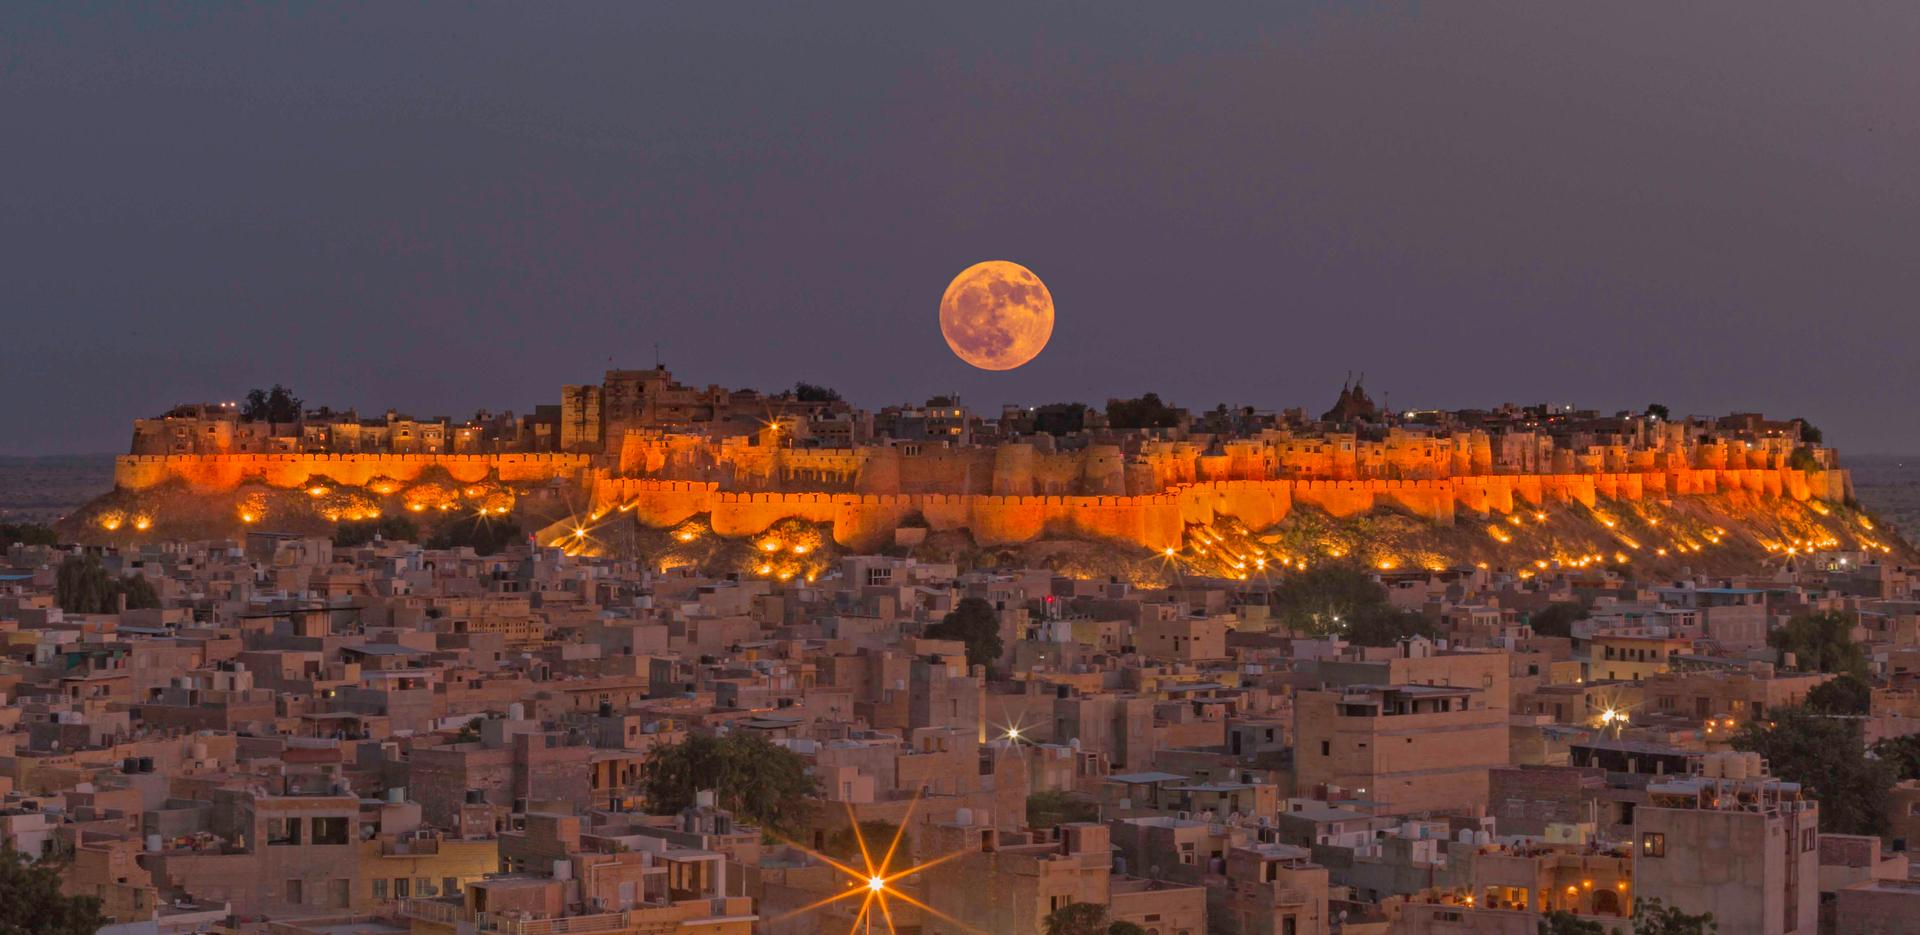 Jaisalmer the Golden City